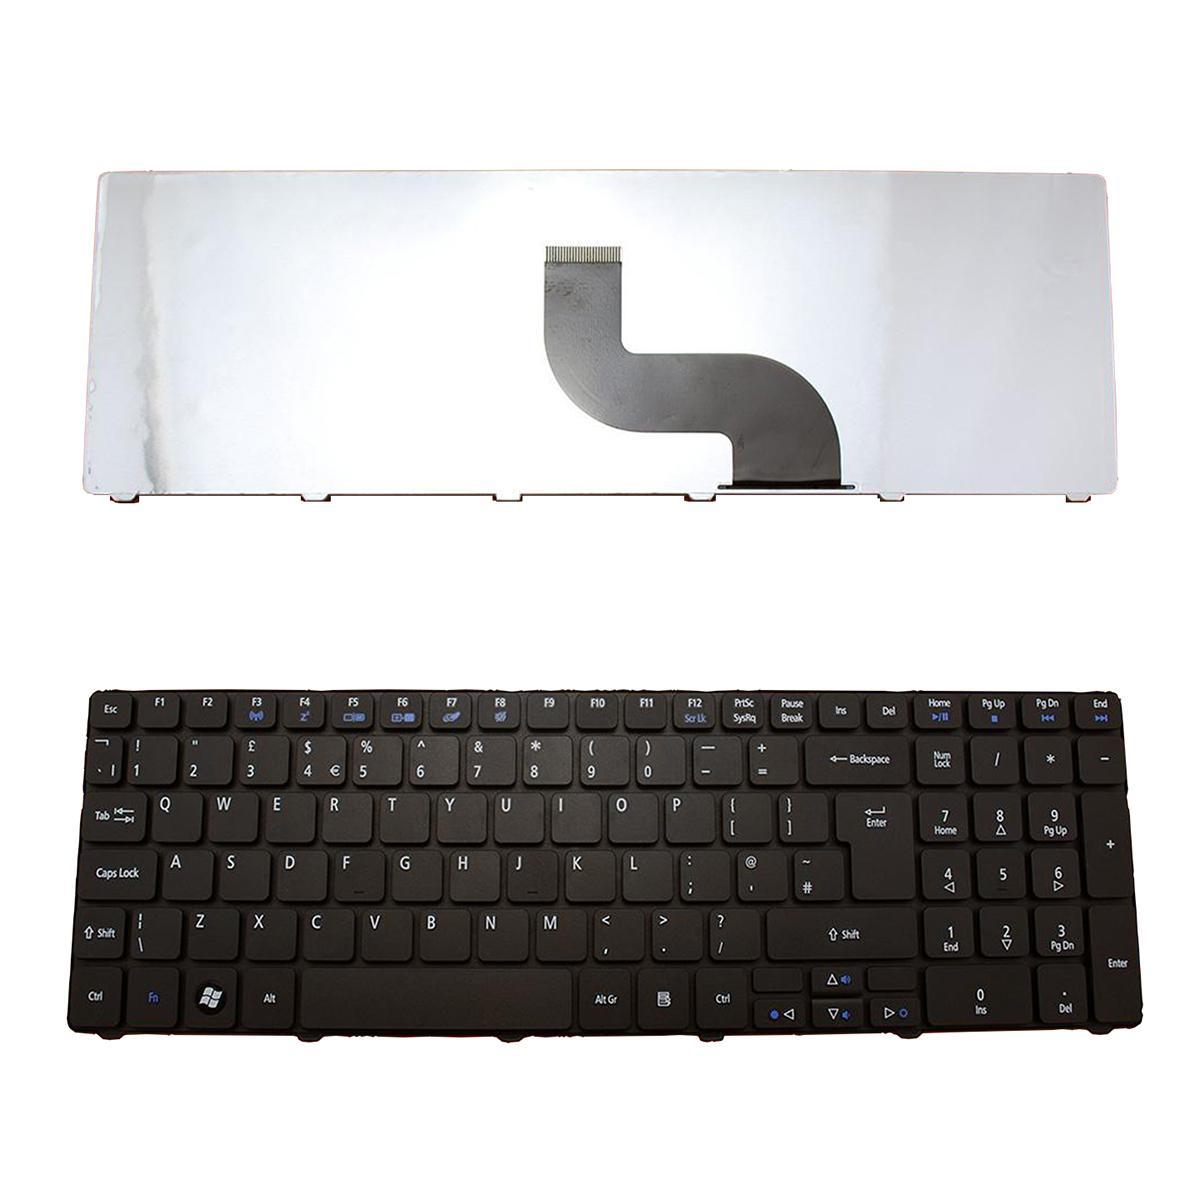 Novo teclado Para Acer Aspire 5810T 5536G 5738Z 5810 5739 5338 5410t 5538 5542 5538G 5542G 7560 7560G 7739 5625G teclado layout de Reino Unido